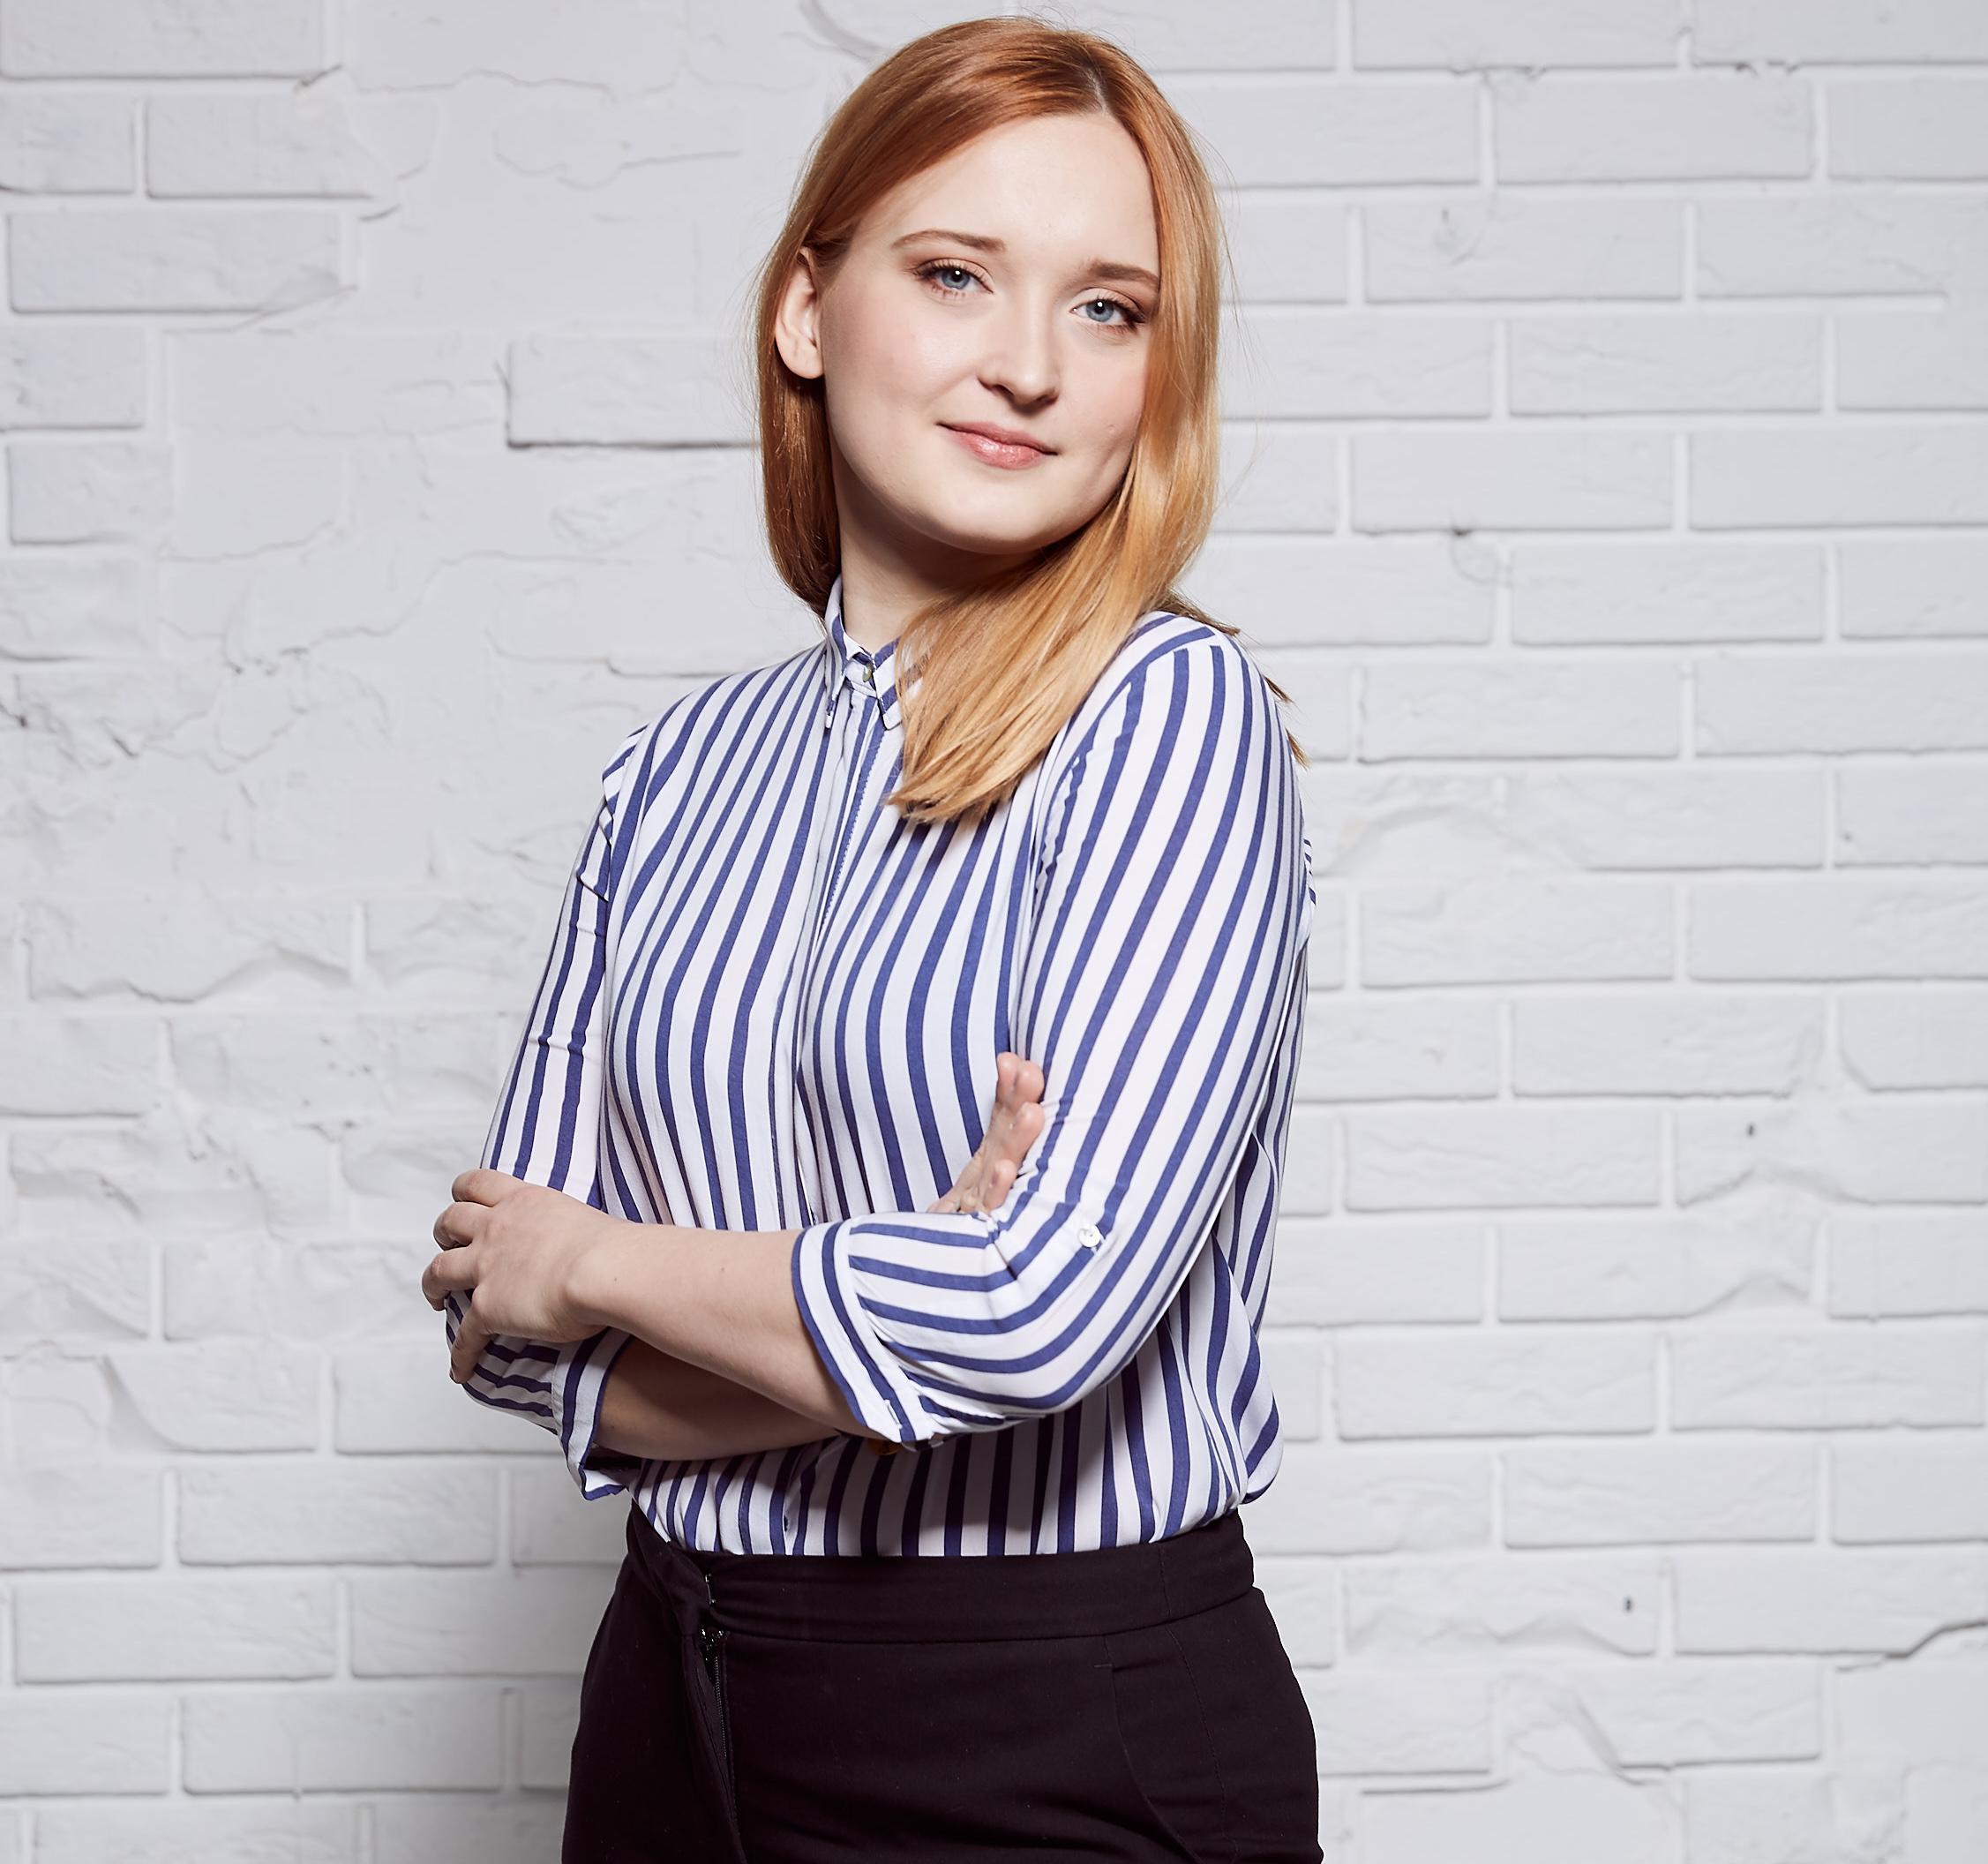 Zuzanna Kaca